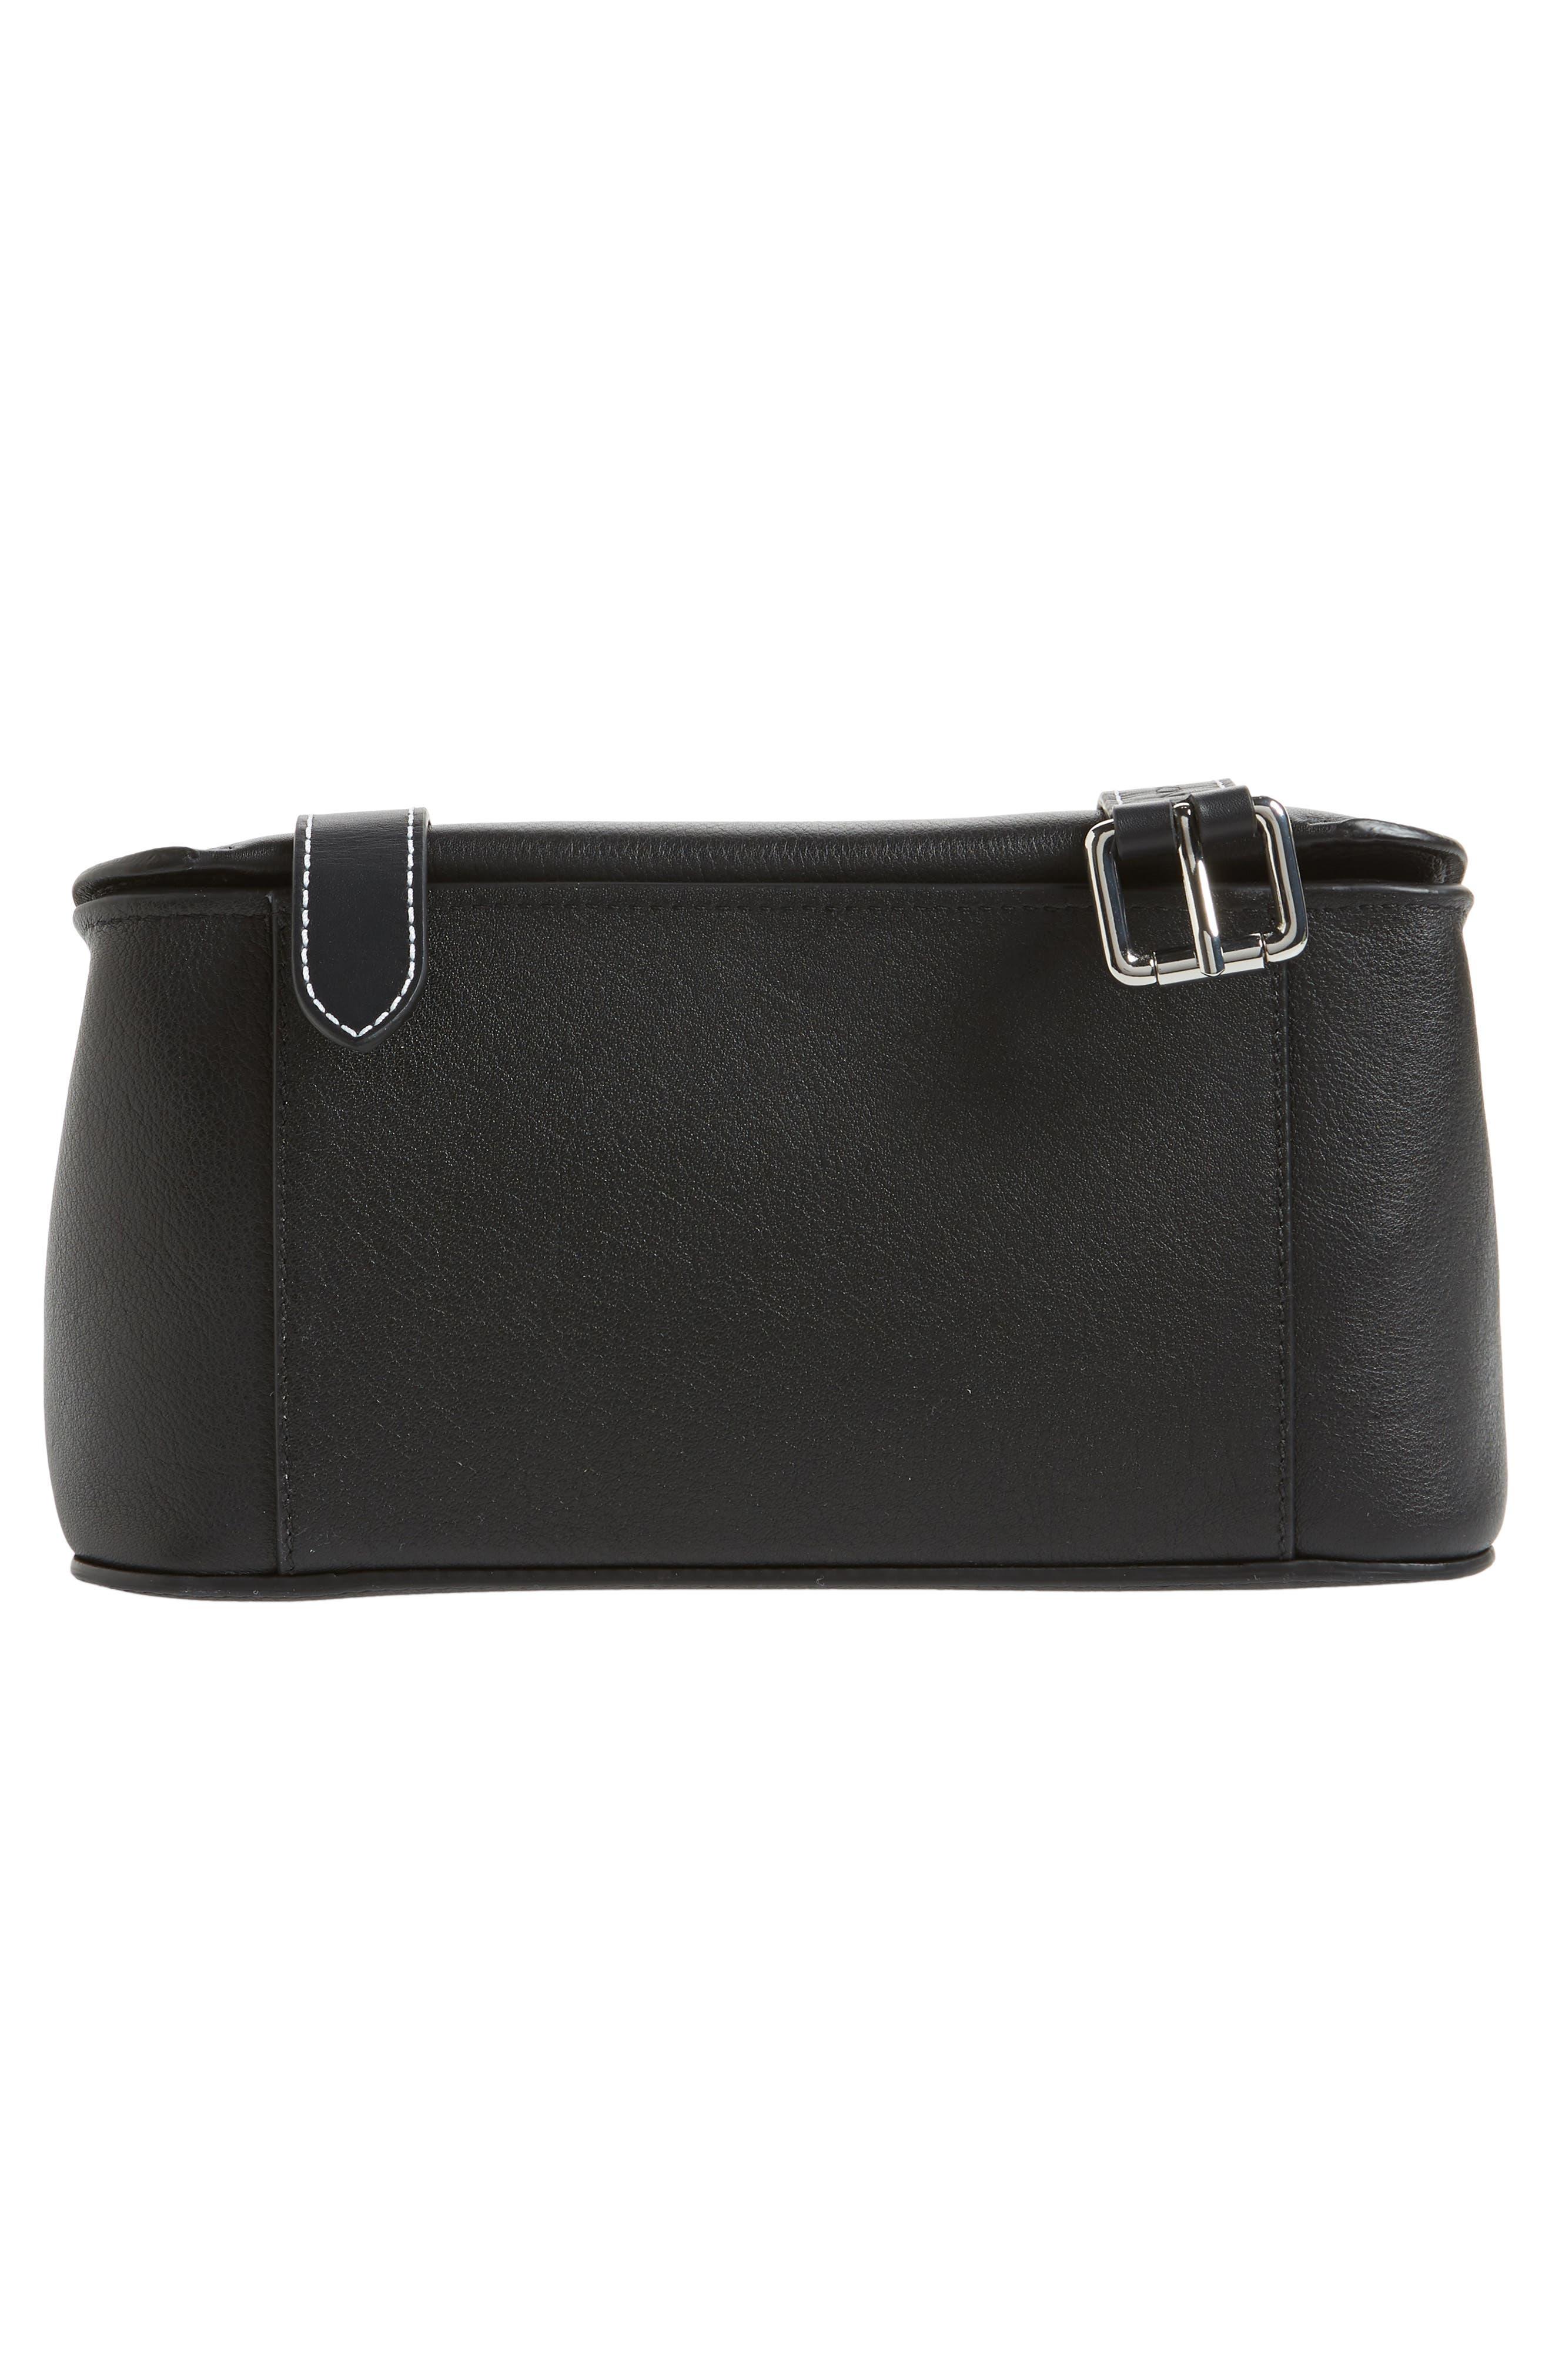 JW ANDERSON,                             Disc Leather Top Handle Satchel,                             Alternate thumbnail 6, color,                             BLACK